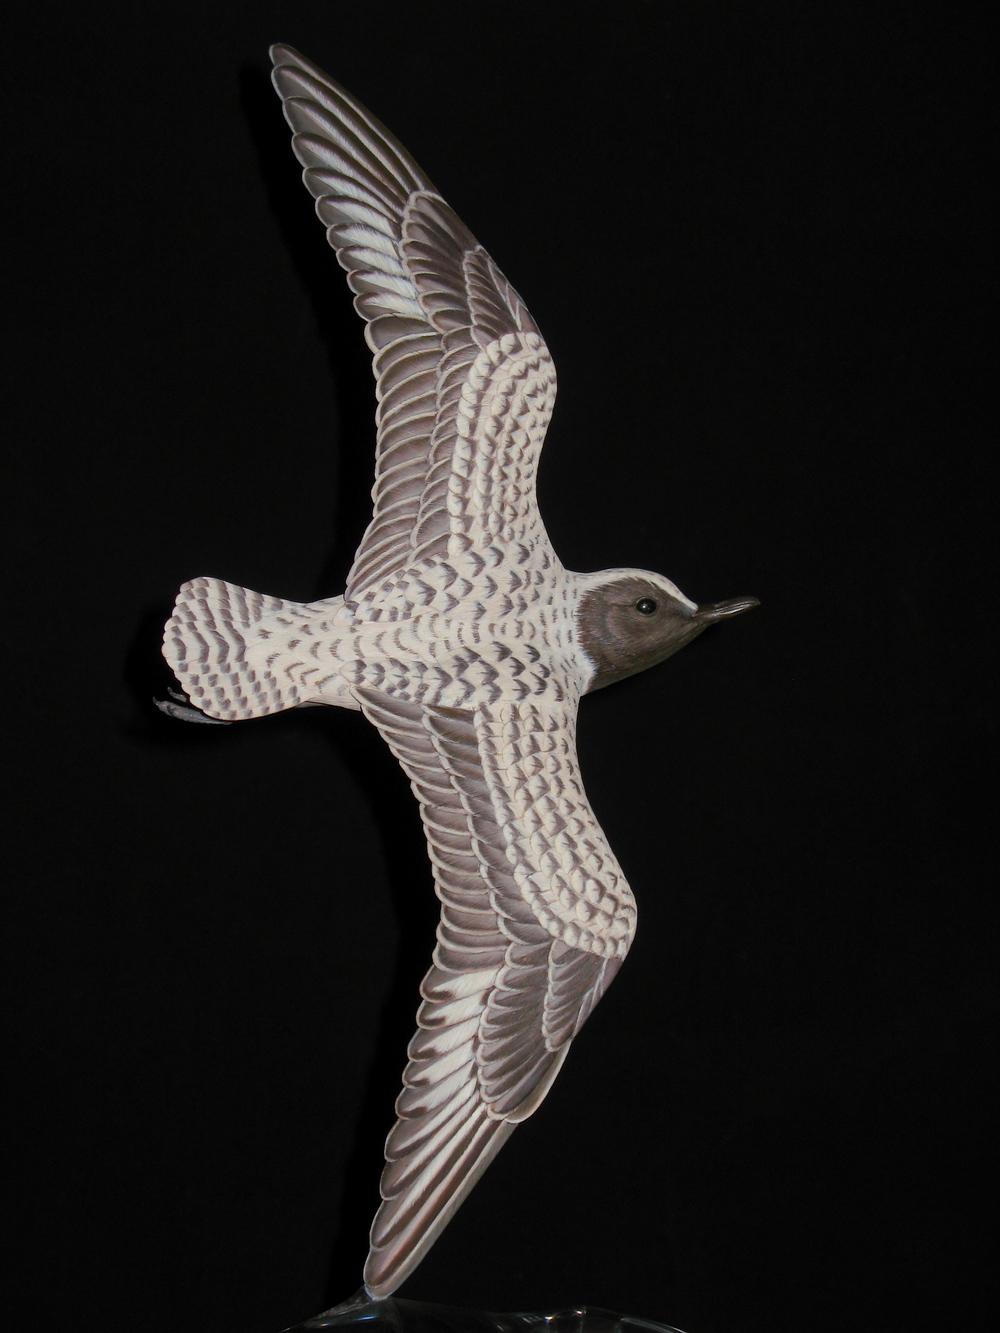 """Plover Flight in Black & White"", Black-bellied Plover, Life-sized, ♂"